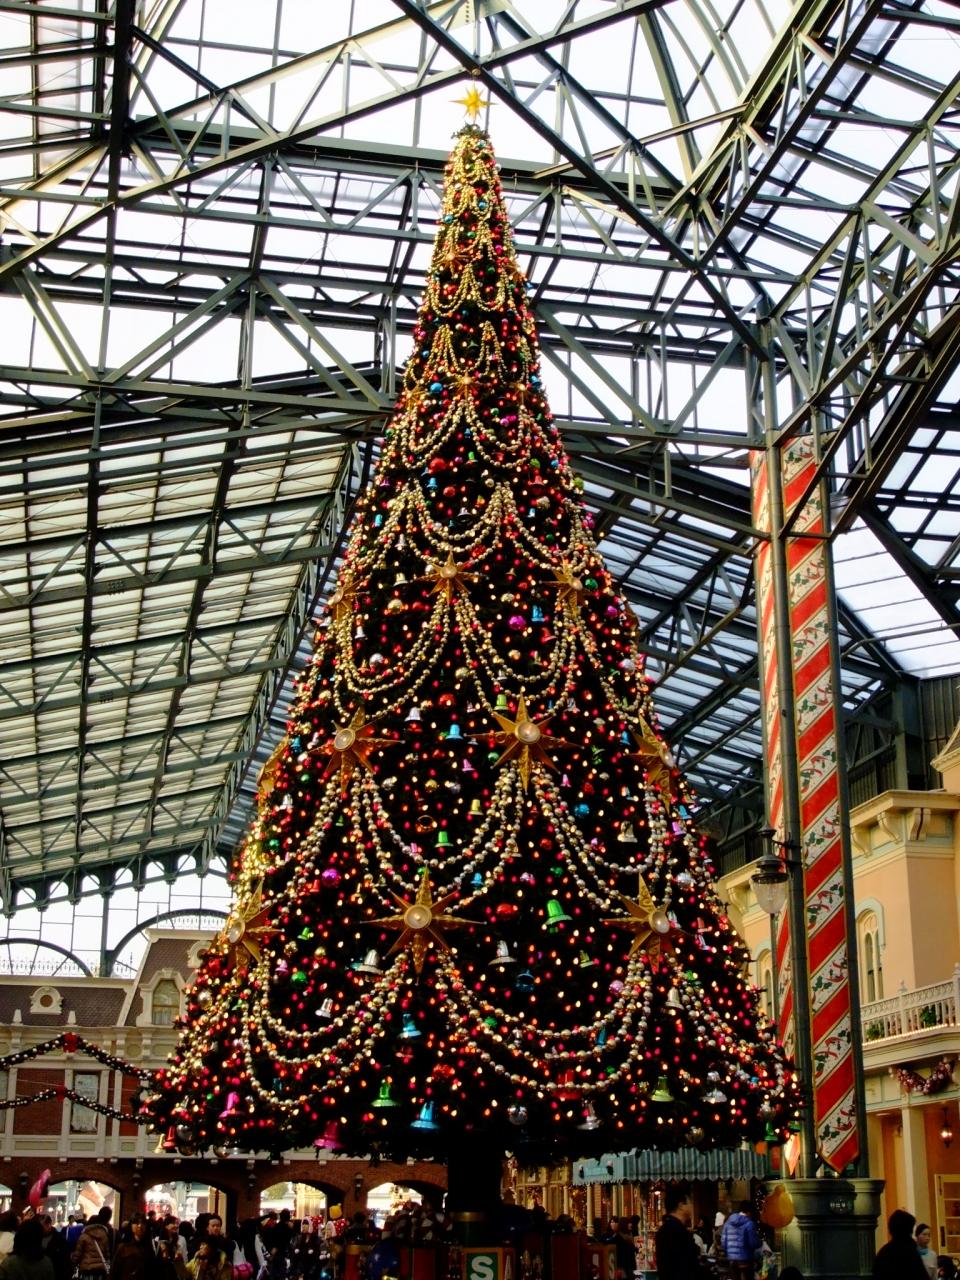 2009 christmas in tokyo disney resort (2)』東京ディズニー